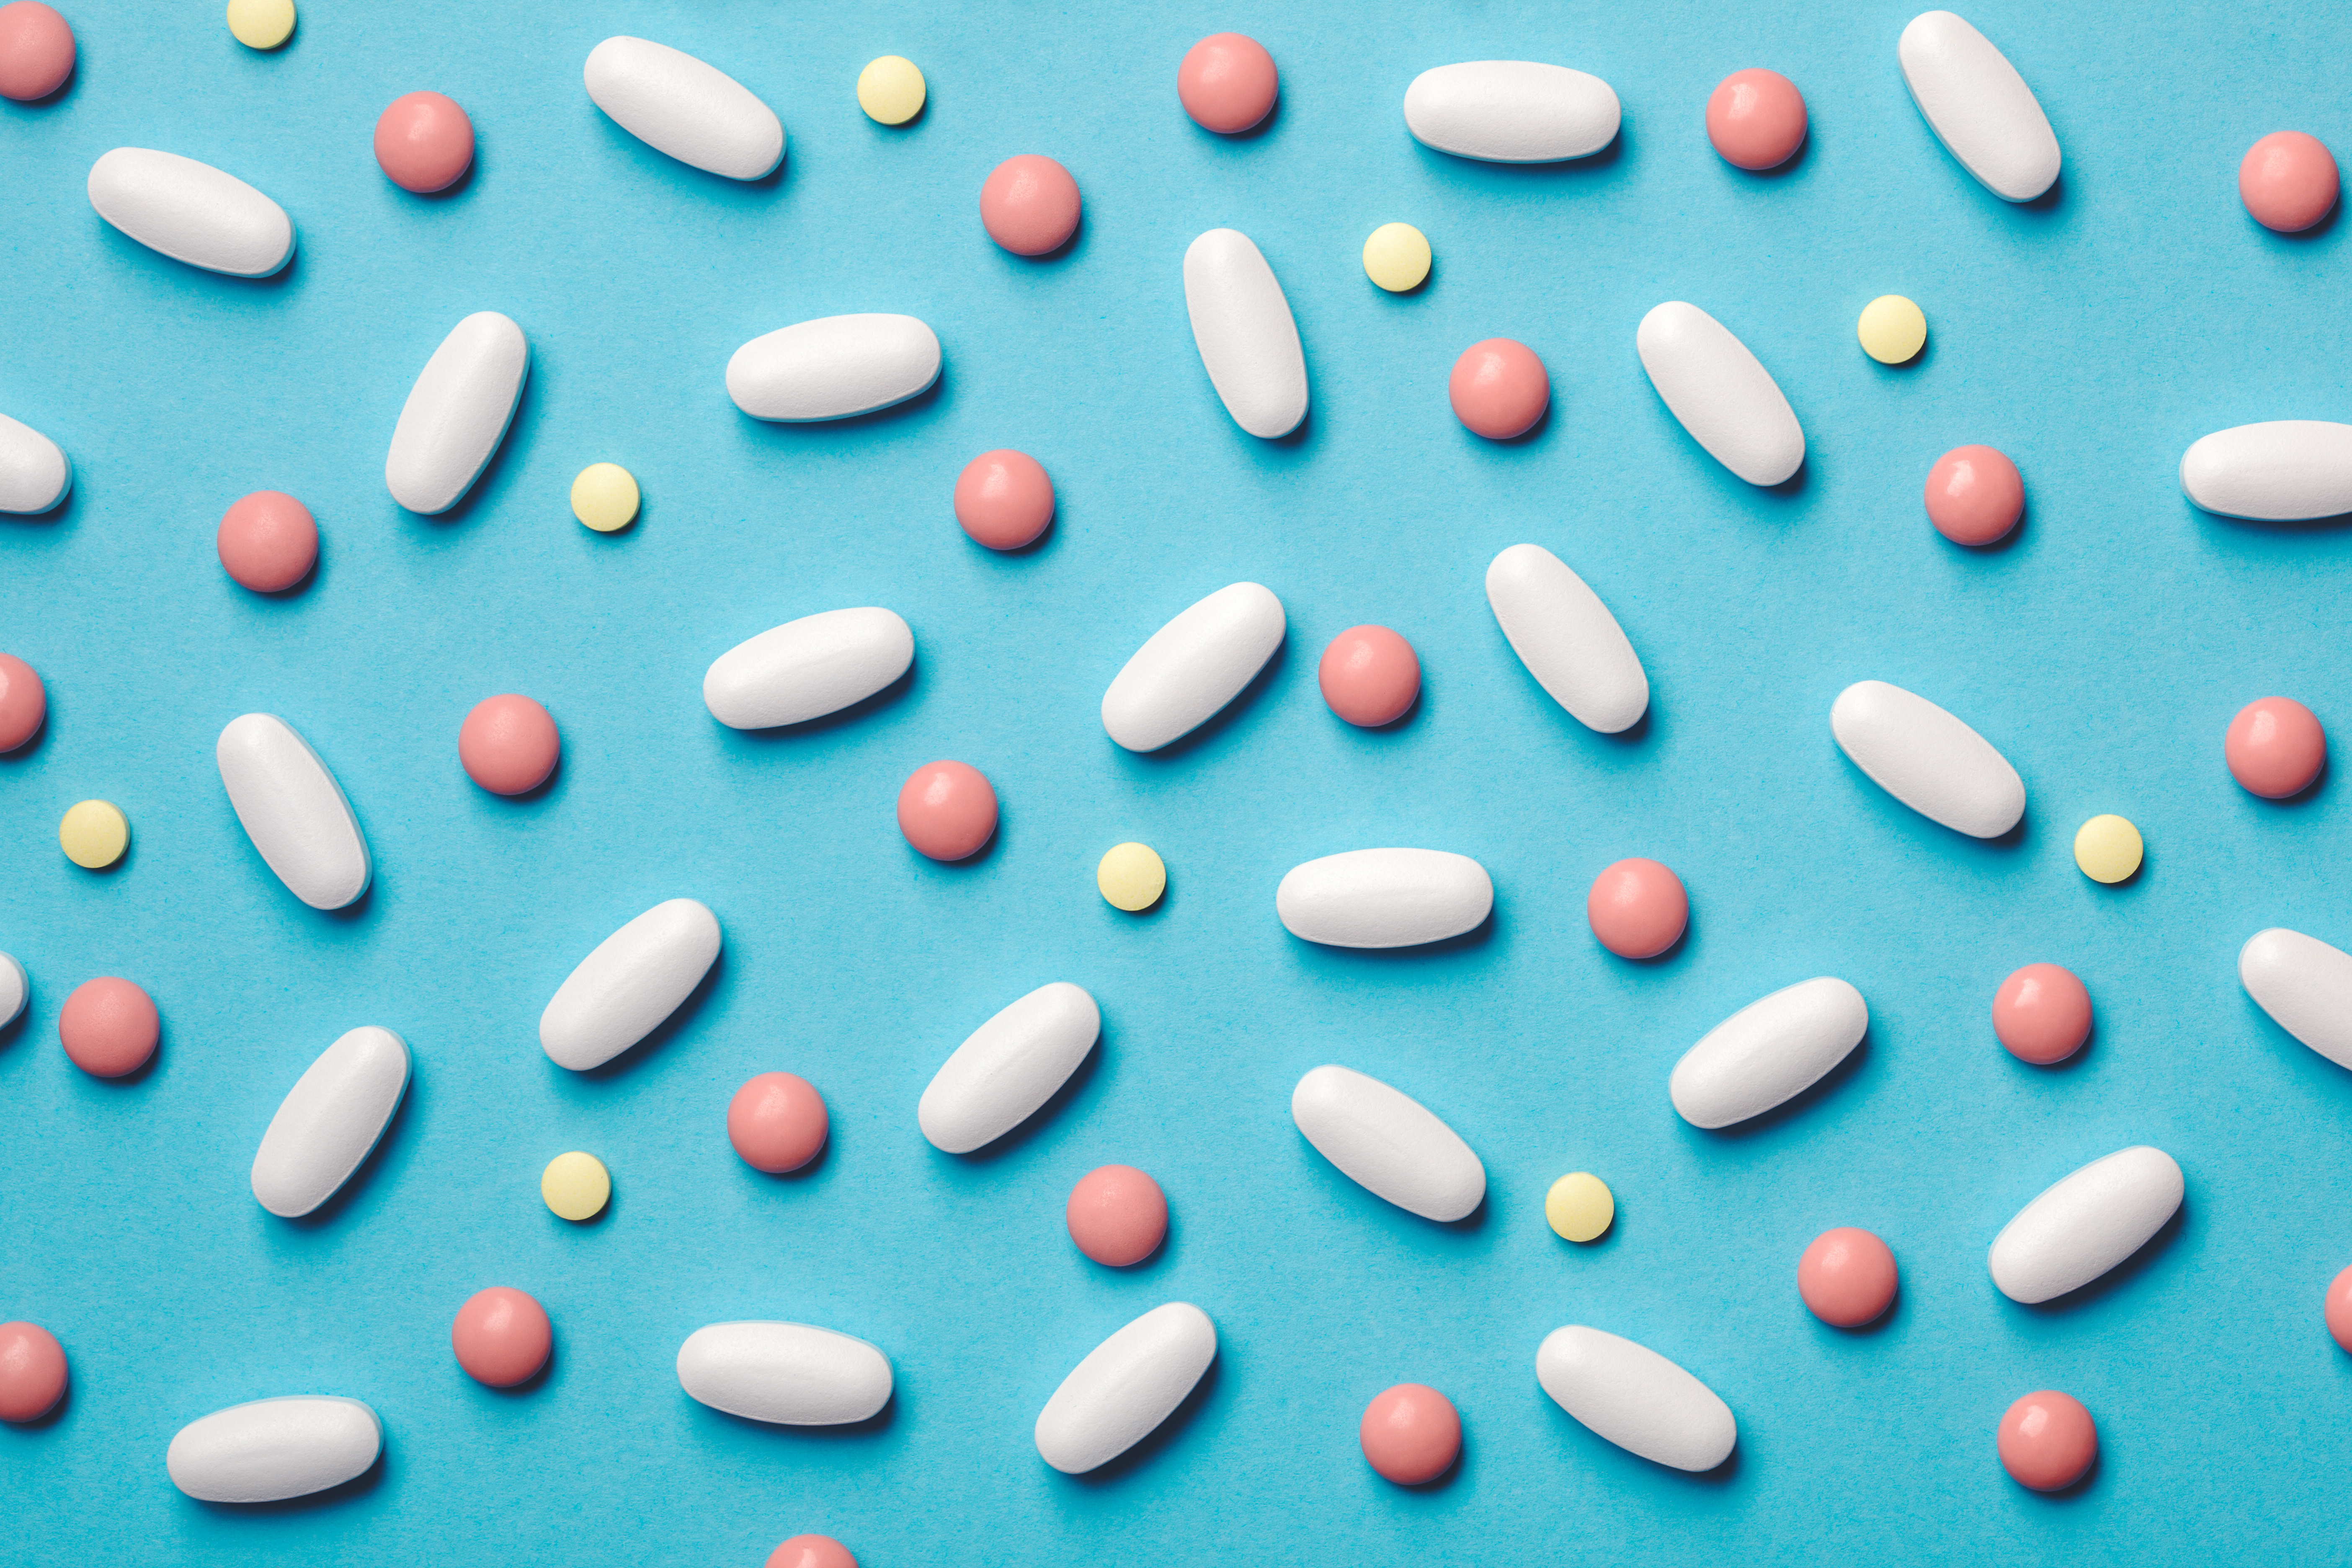 Antibiotic uses